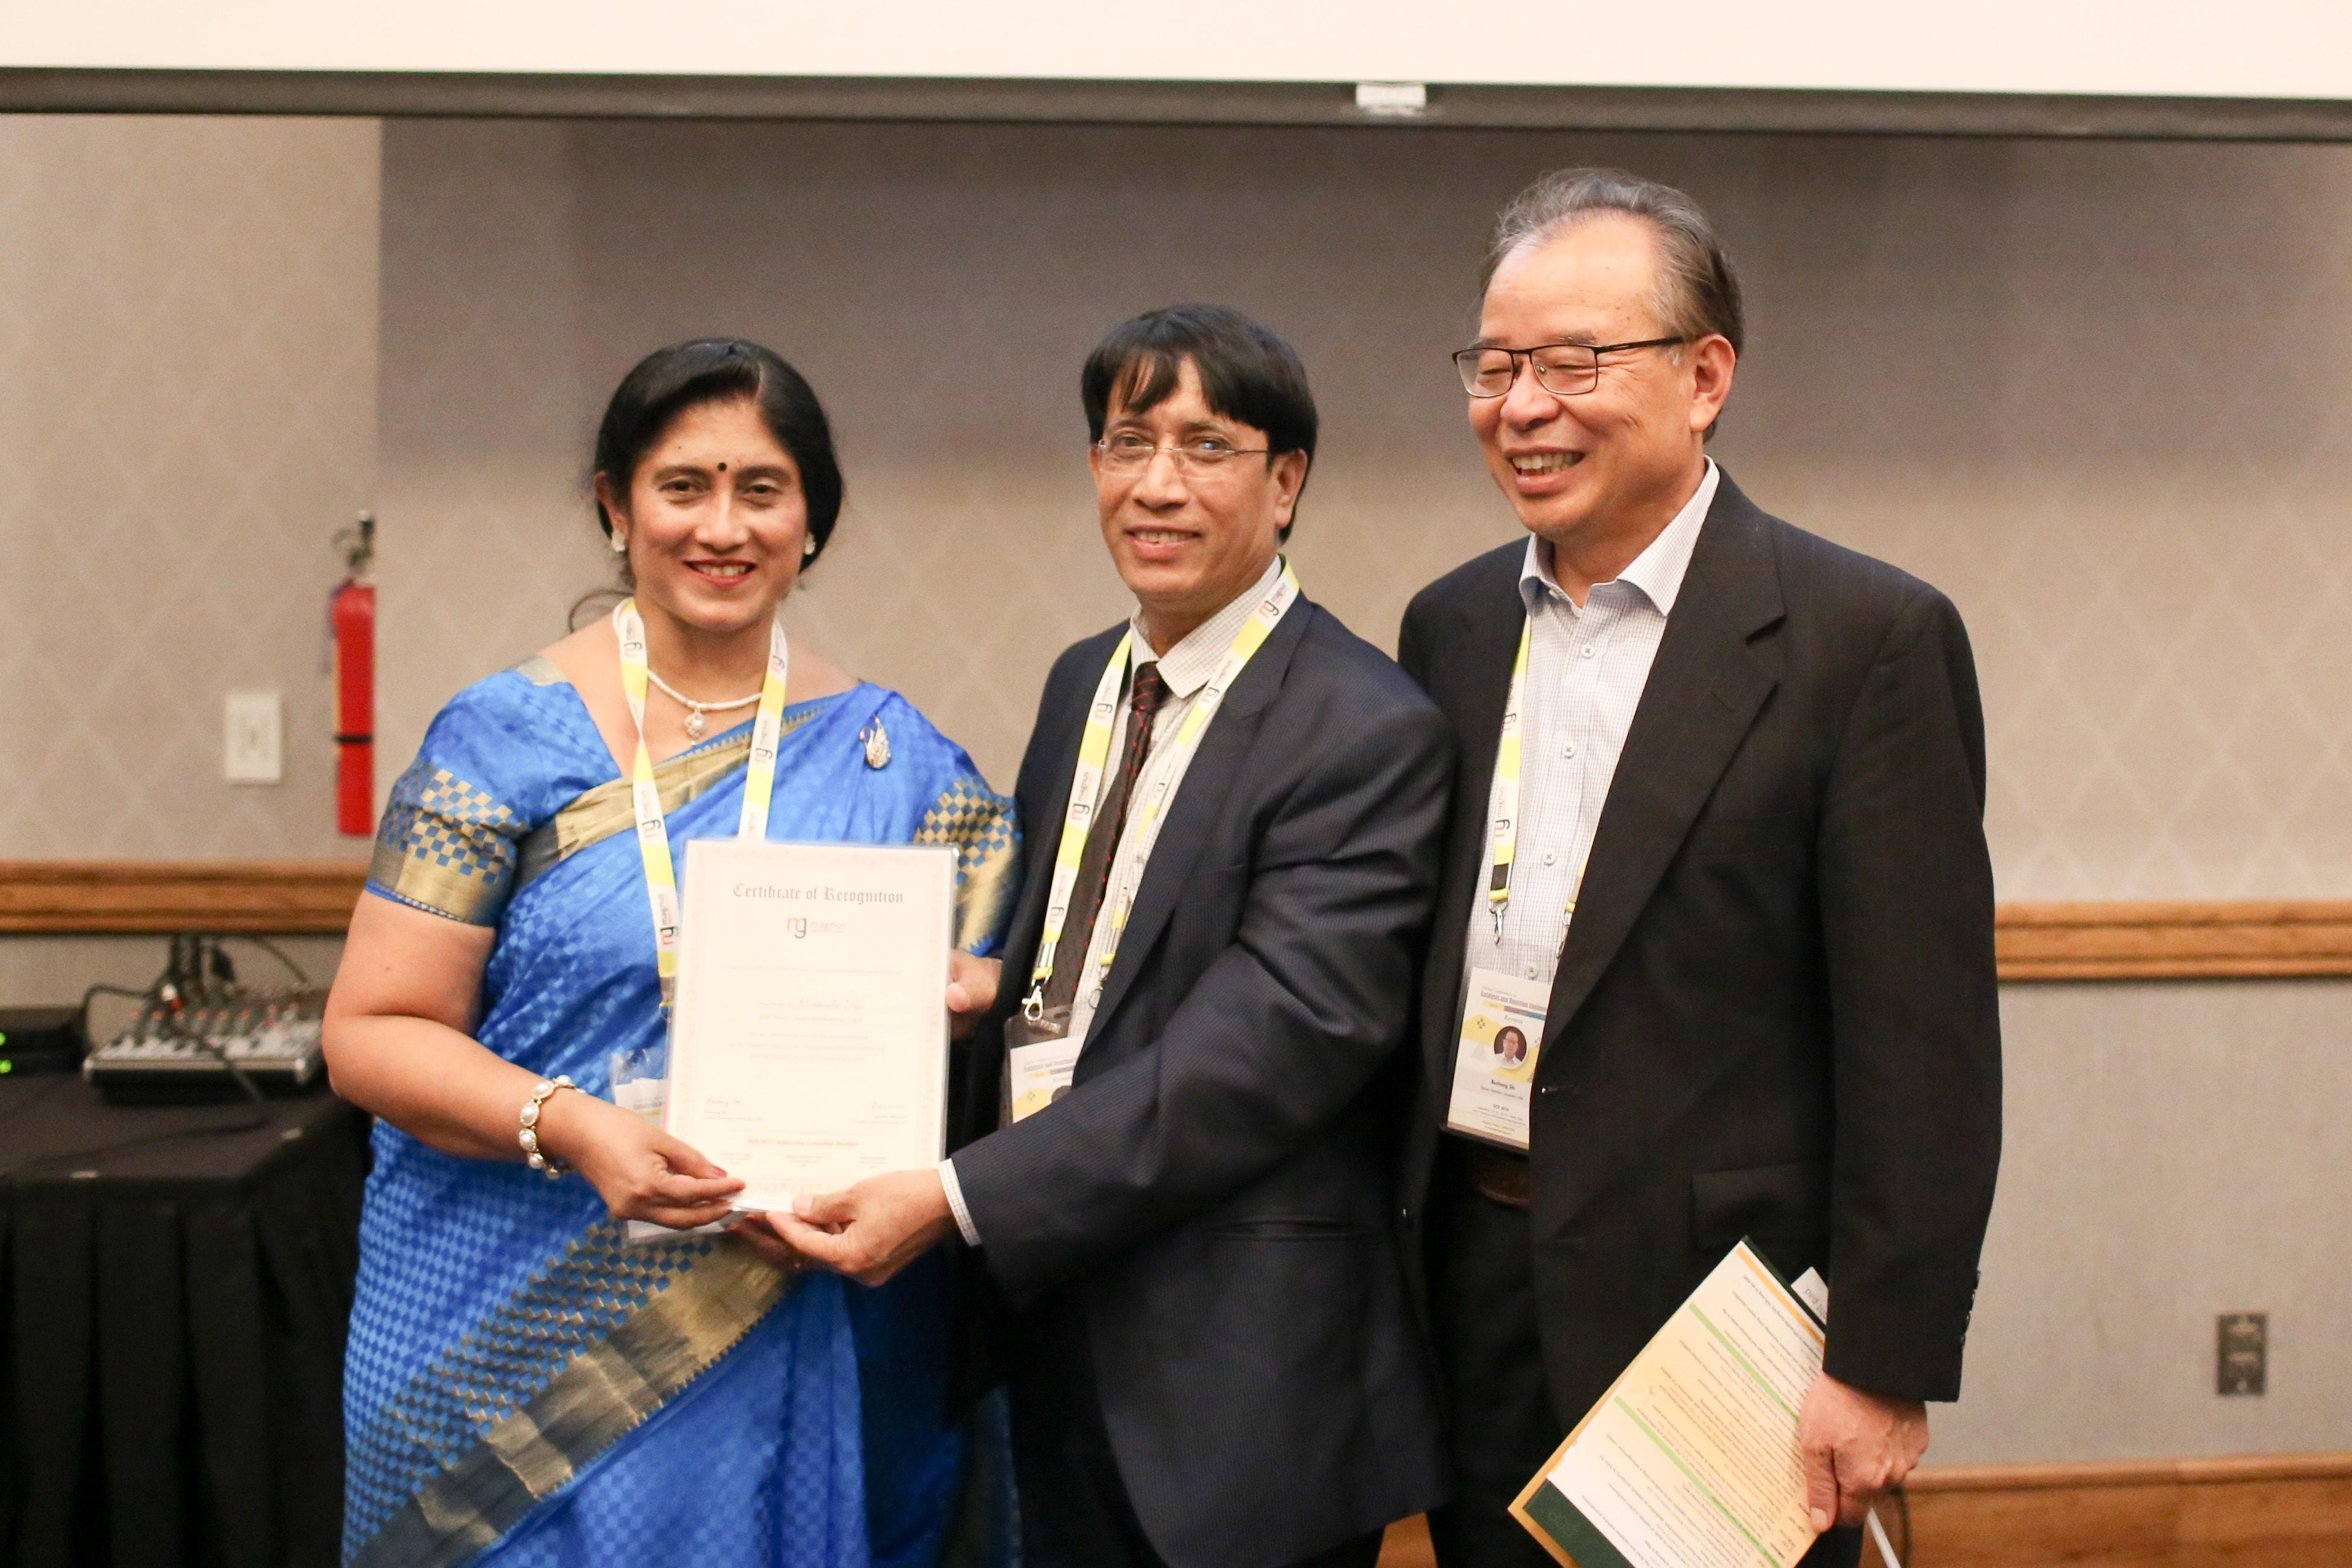 Nirmala Vaz felicitated by Dibakar Chandra Deka